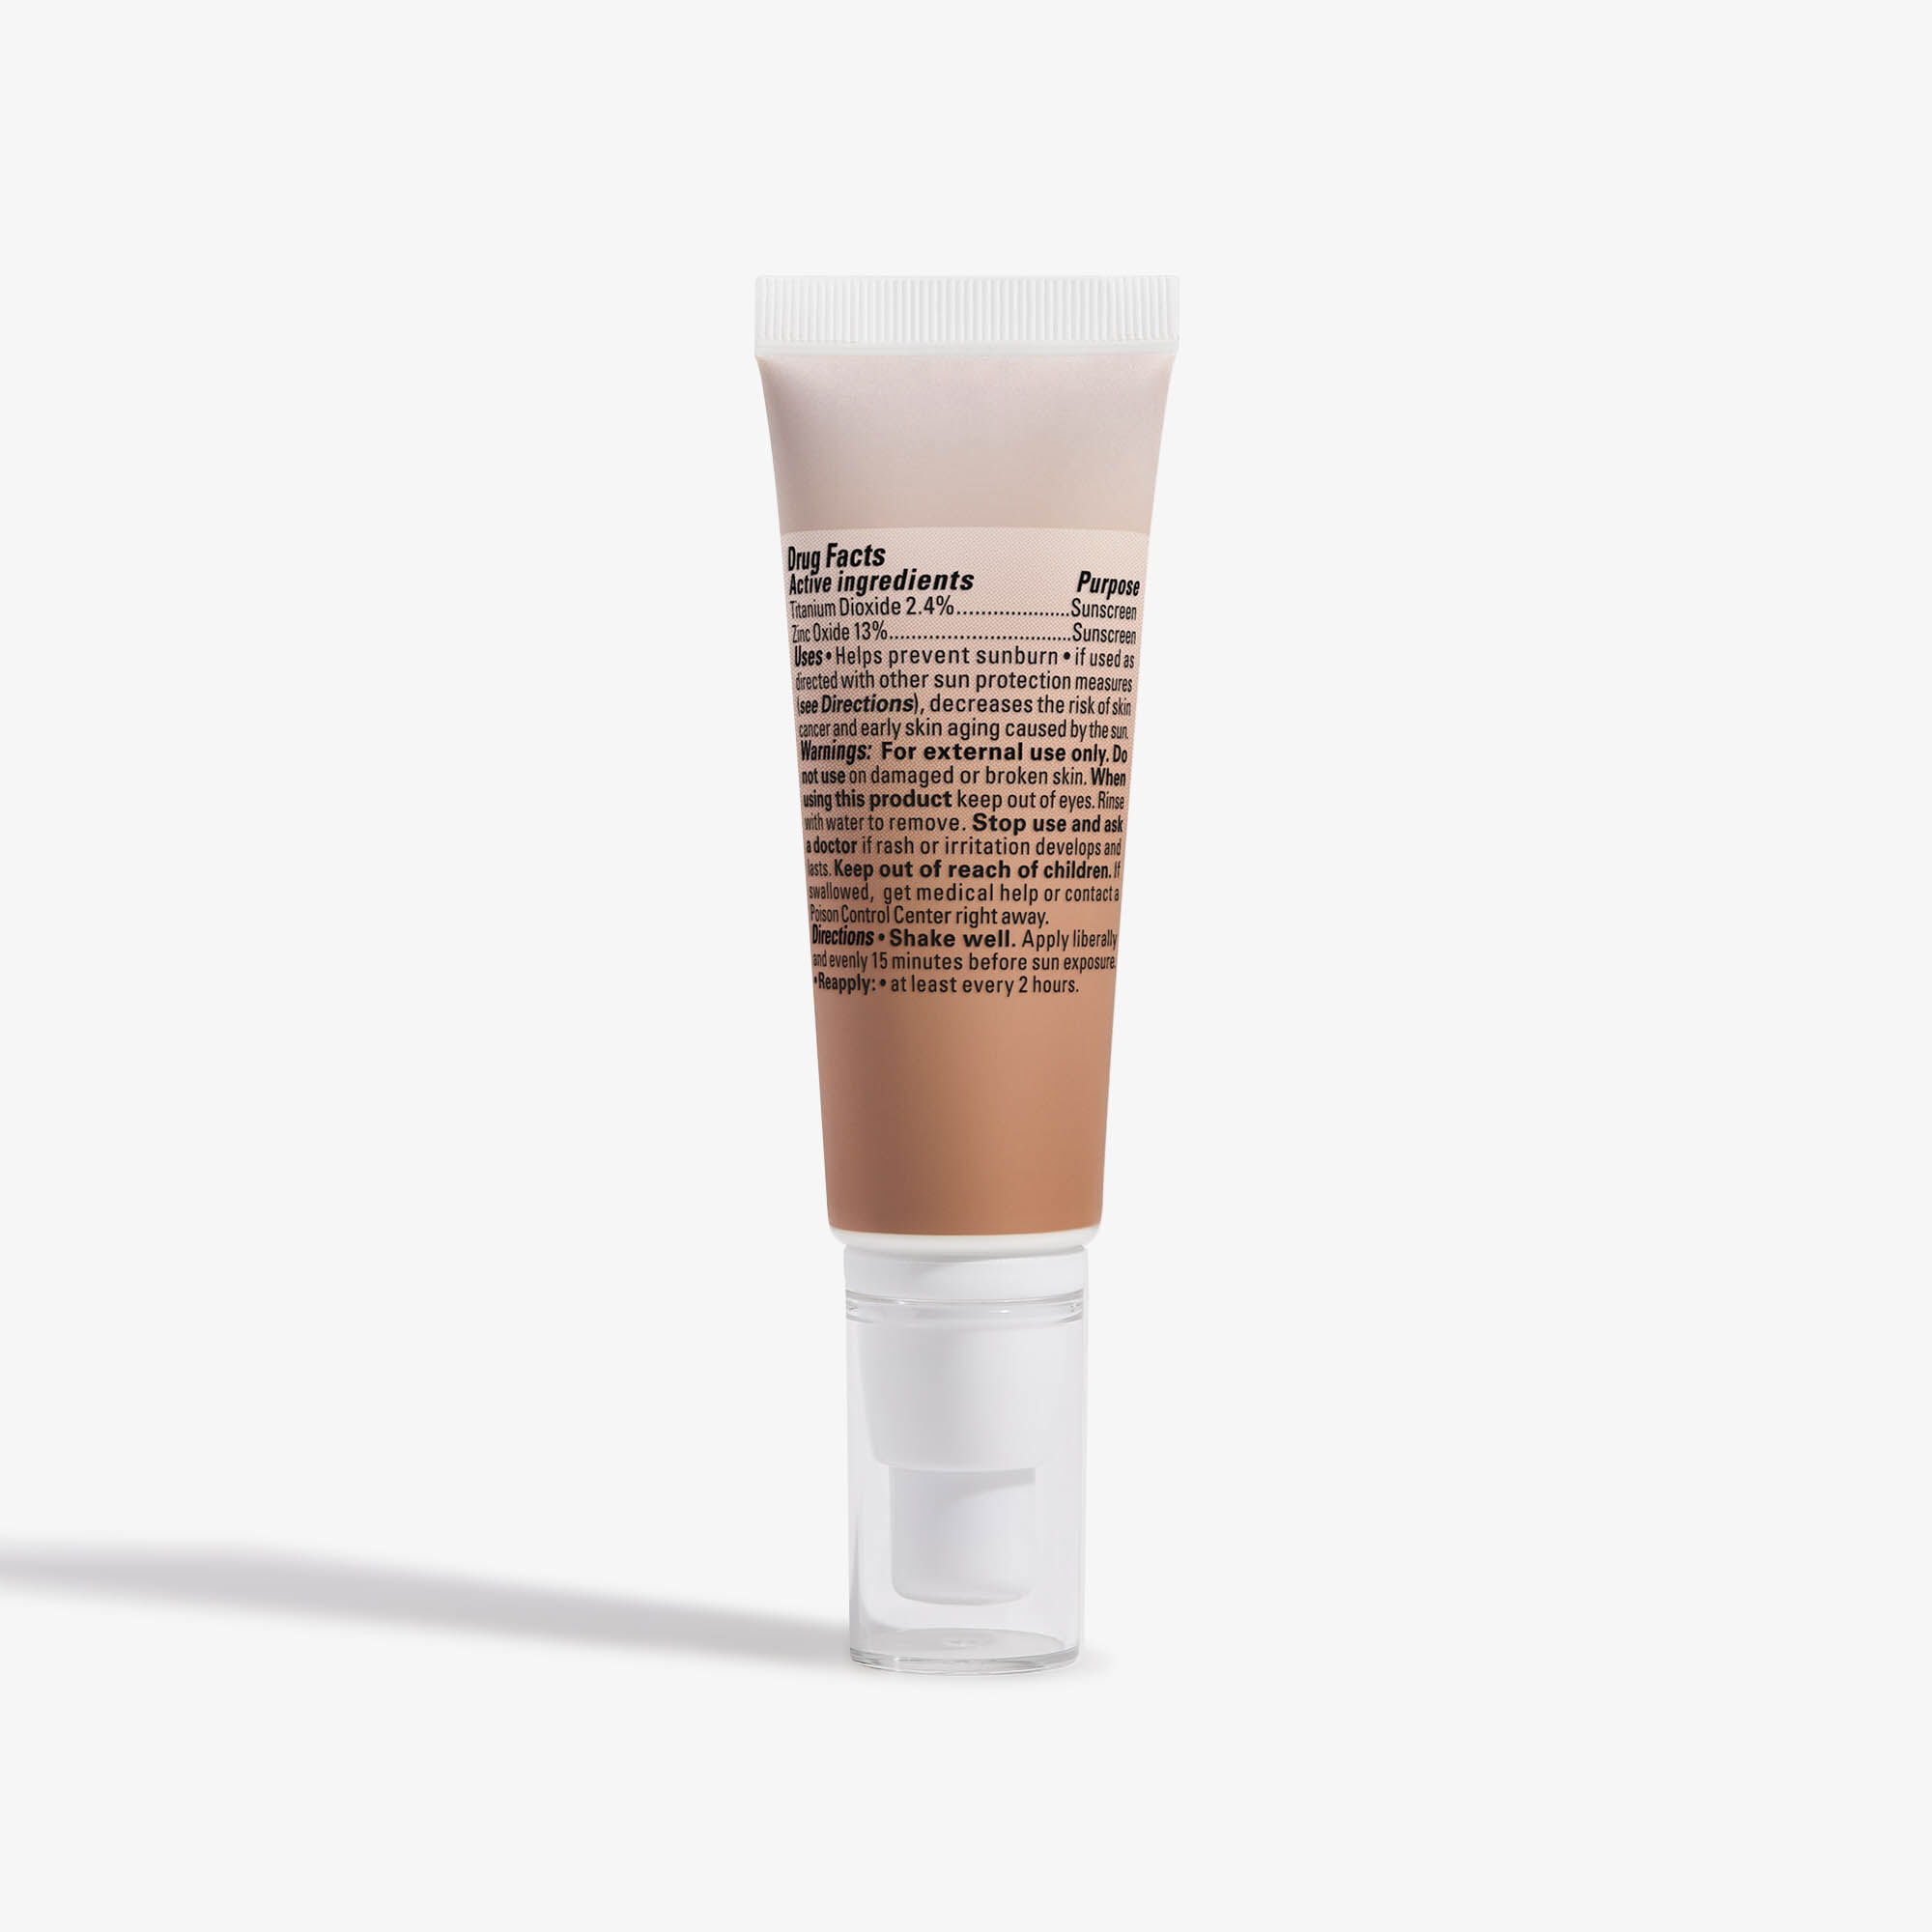 CCC Clean Corrective With Vitamin C Tinted Moisturizer, Medium